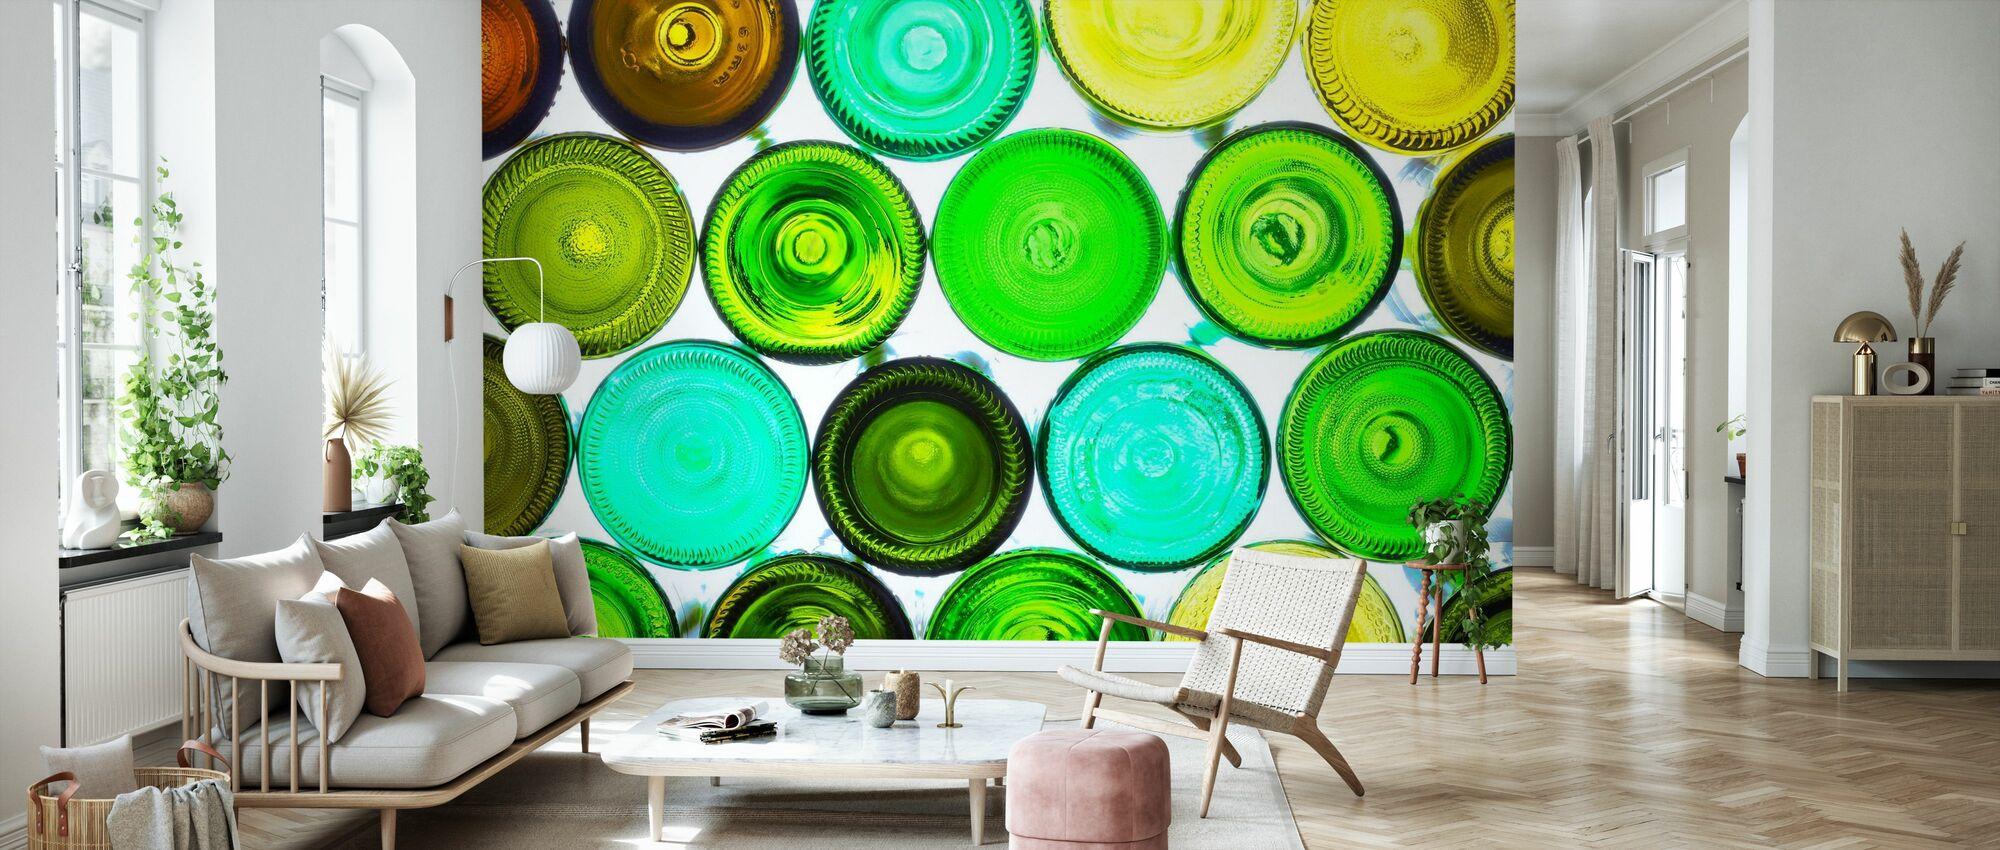 Colorful Bottle Bottoms - Wallpaper - Living Room